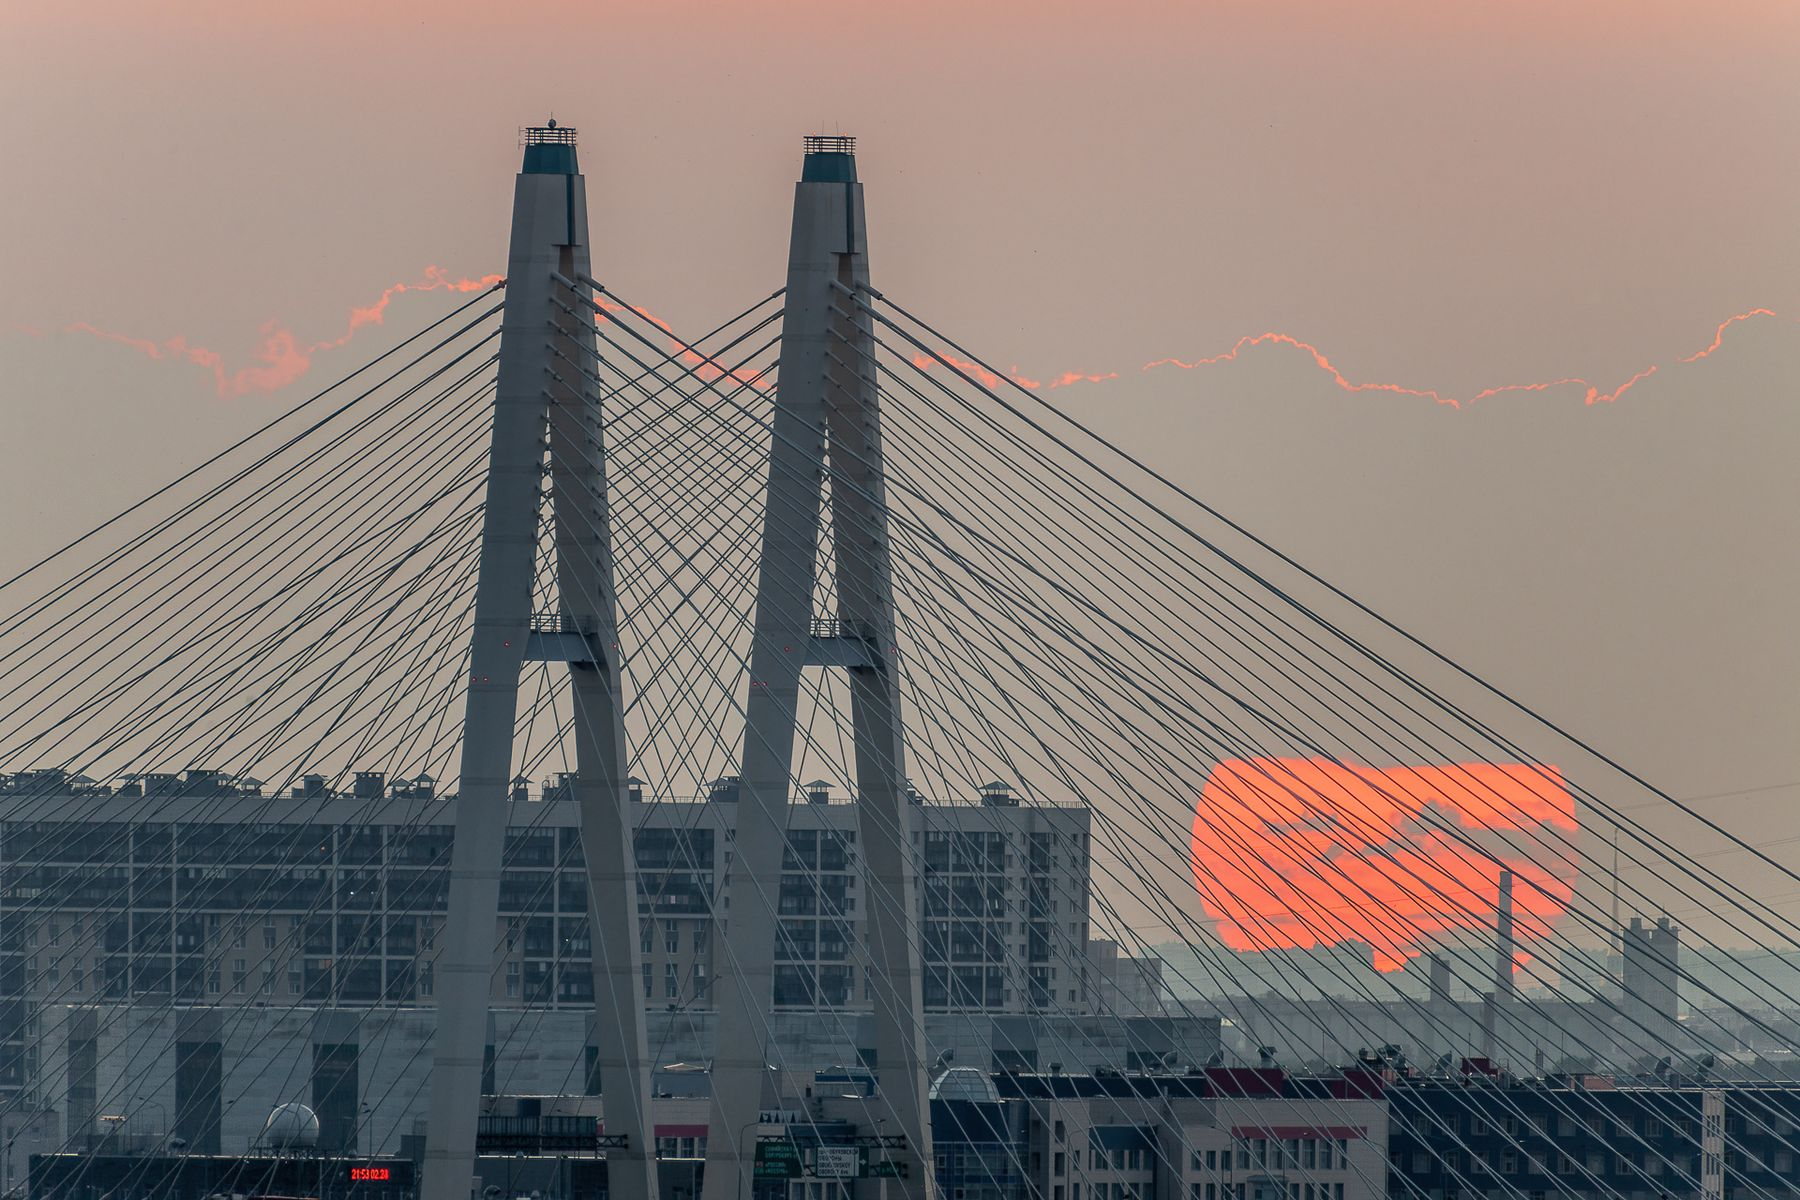 Закат с тучами санкт-петербург вантовый мост солнце лето закат